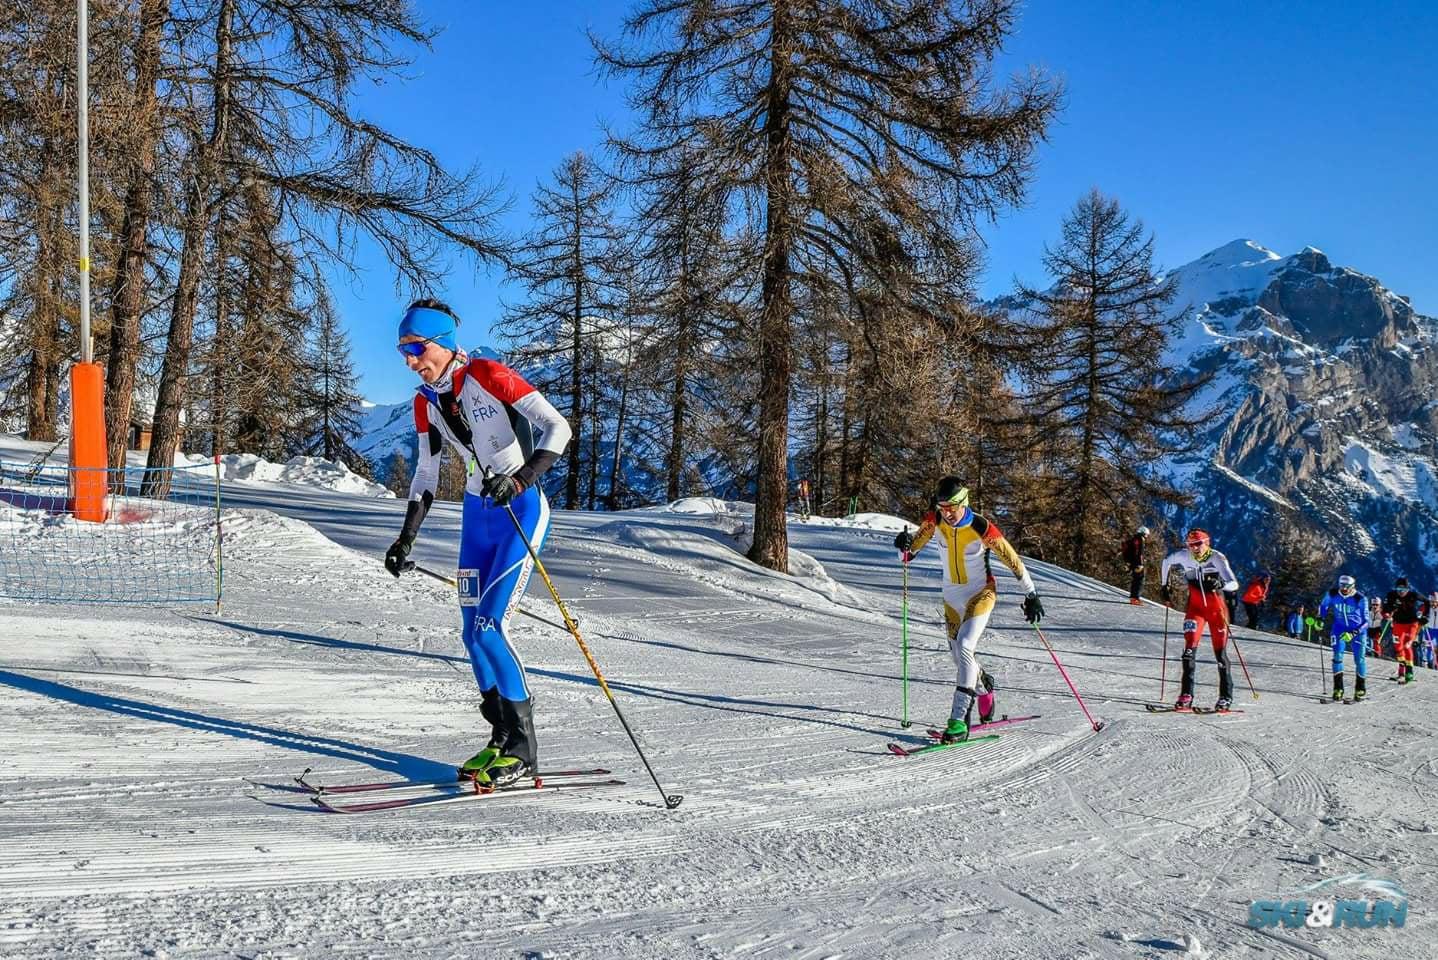 puy_st_vincent_2018_luka_kovacic_foto_ski_run